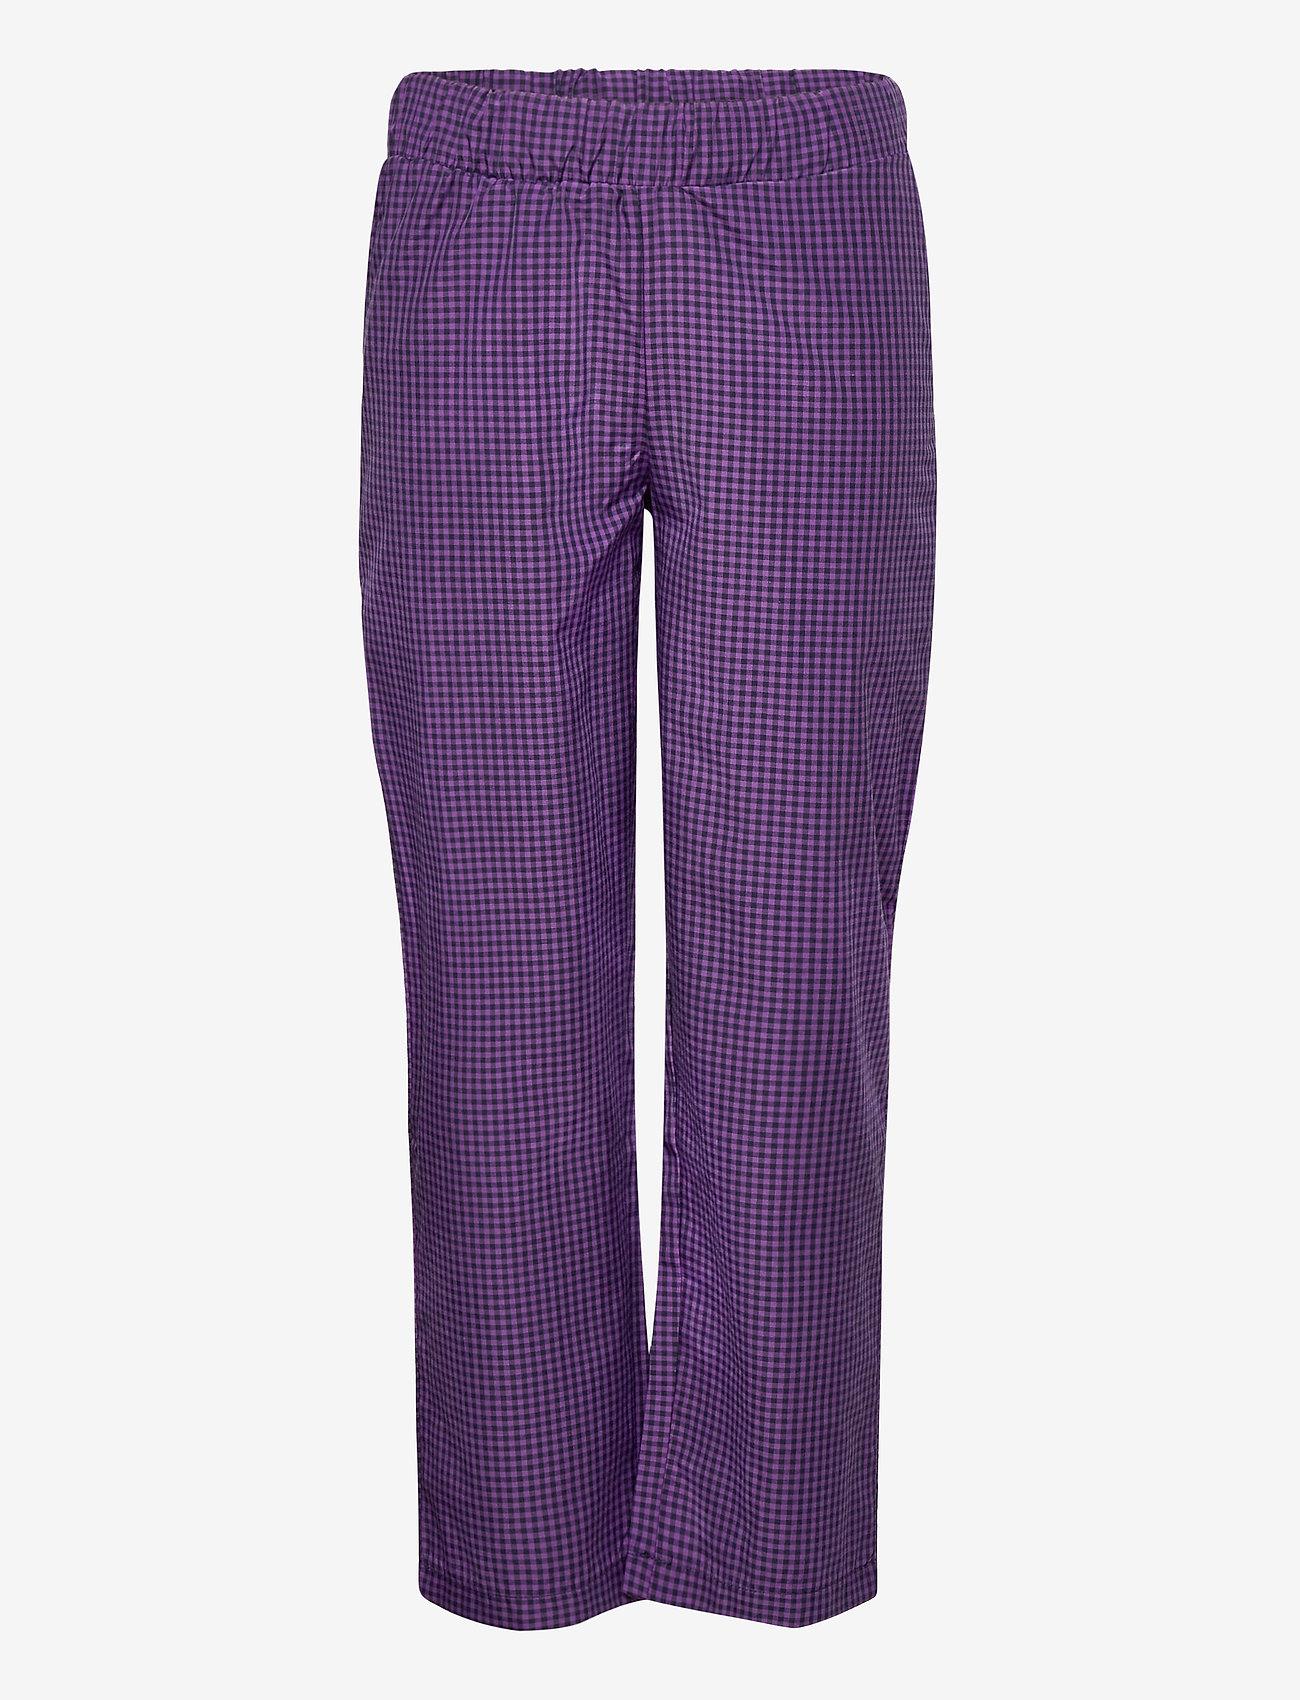 LMTD - NLFSINETTE REG CHECK PANT - hosen - purple reign - 0